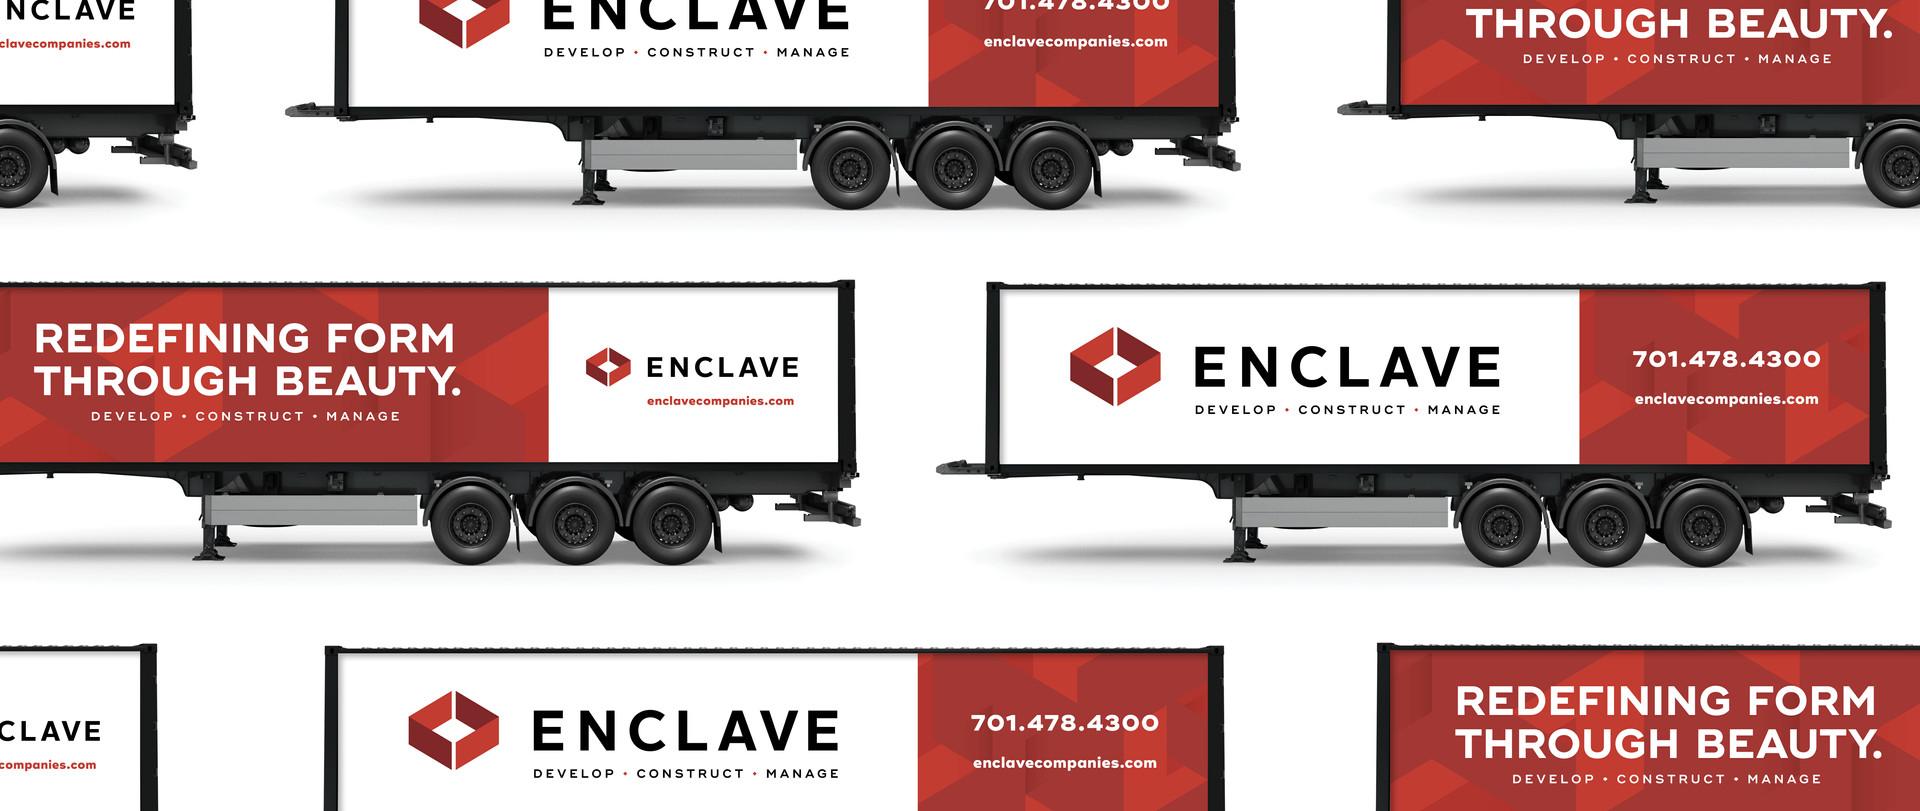 Enclave Image Sizing7.jpg